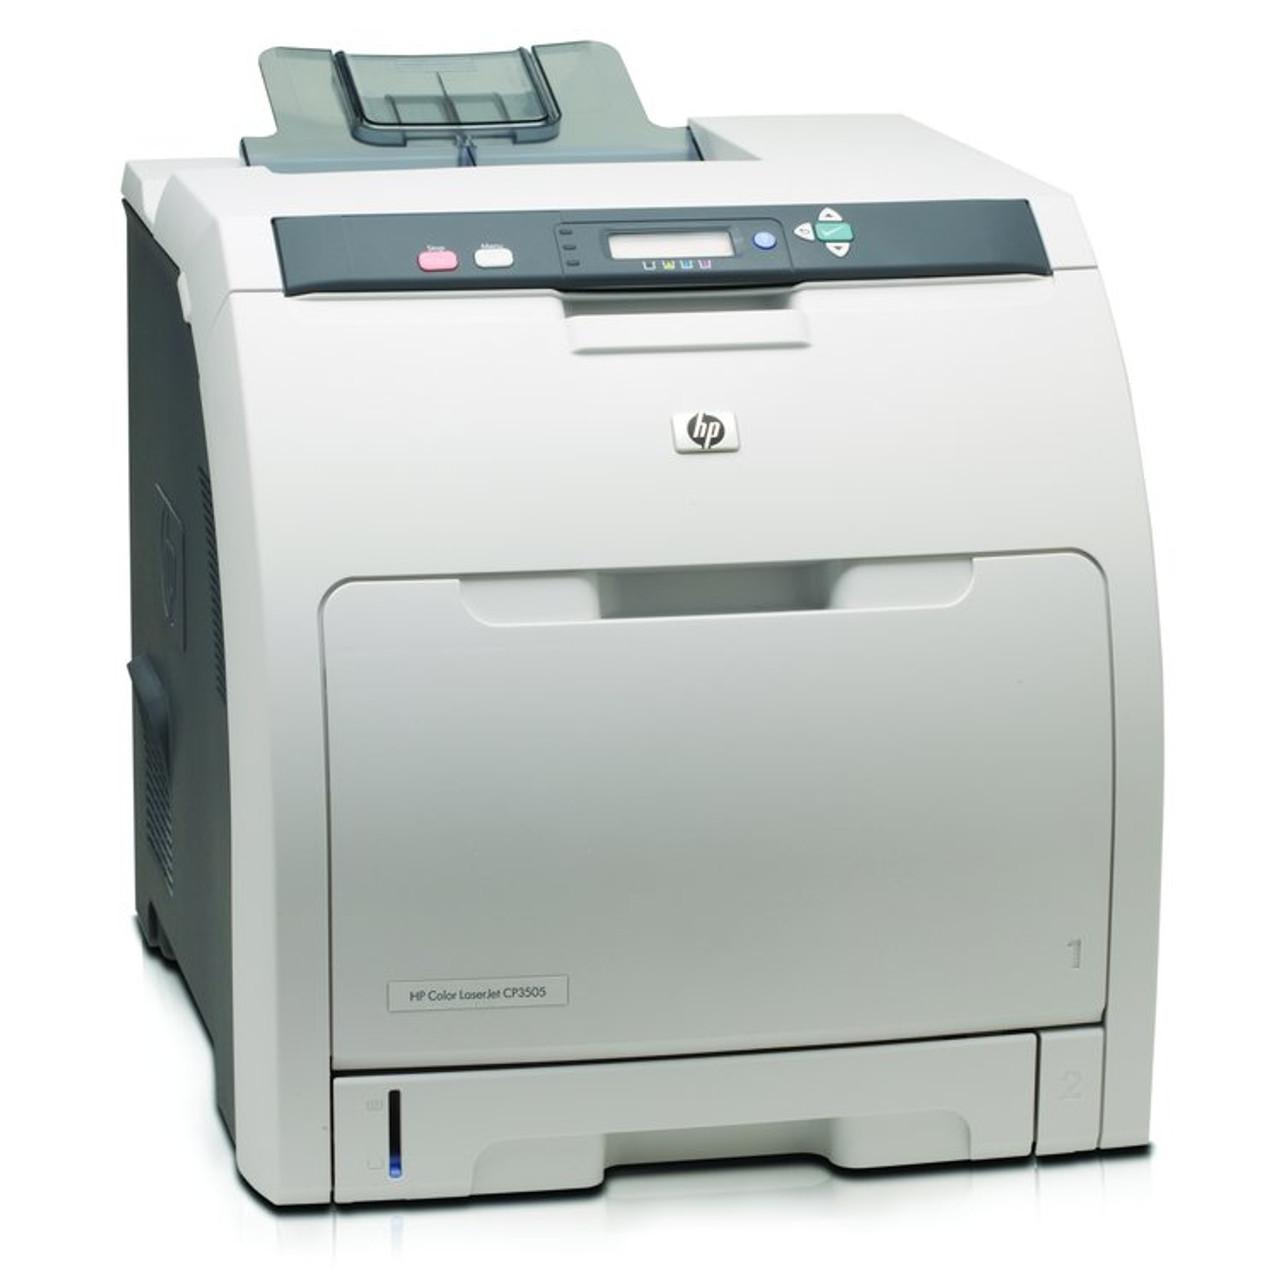 HP Color LaserJet CP3505DN - CB443A - HP Laser Printer for sale